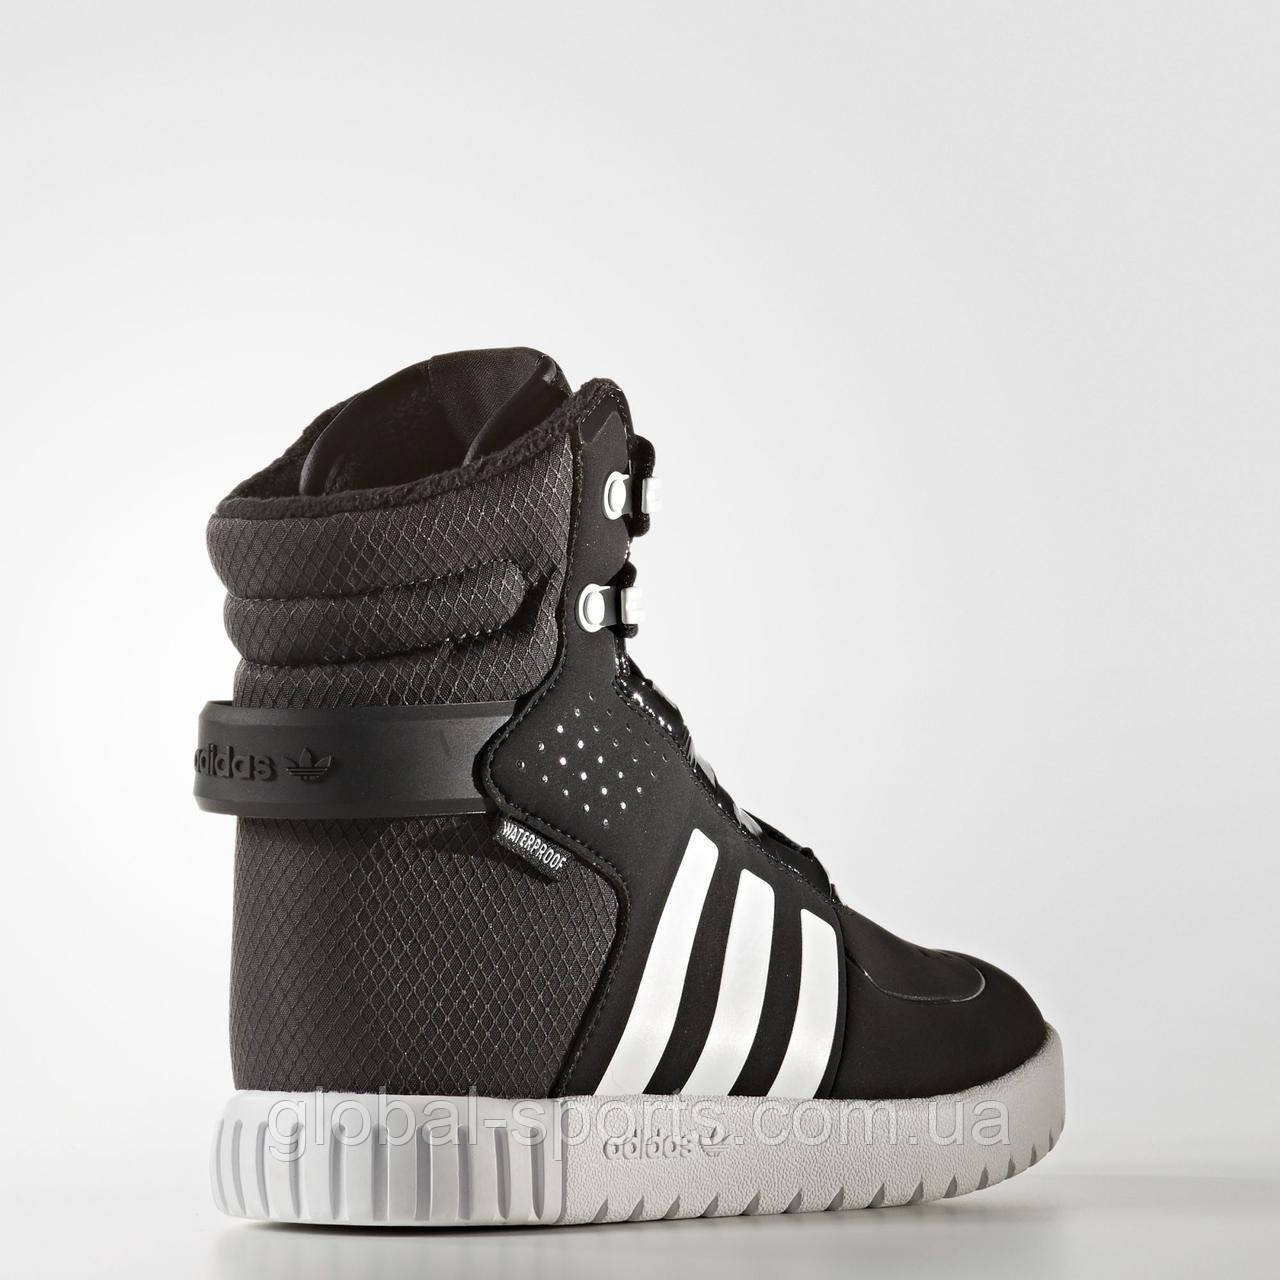 b2649273 Детские зимние кроссовки Adidas originals Trailbreaker(Артикул:BZ0509), цена  1 490 грн., купить в Харькове — Prom.ua (ID#622955196)